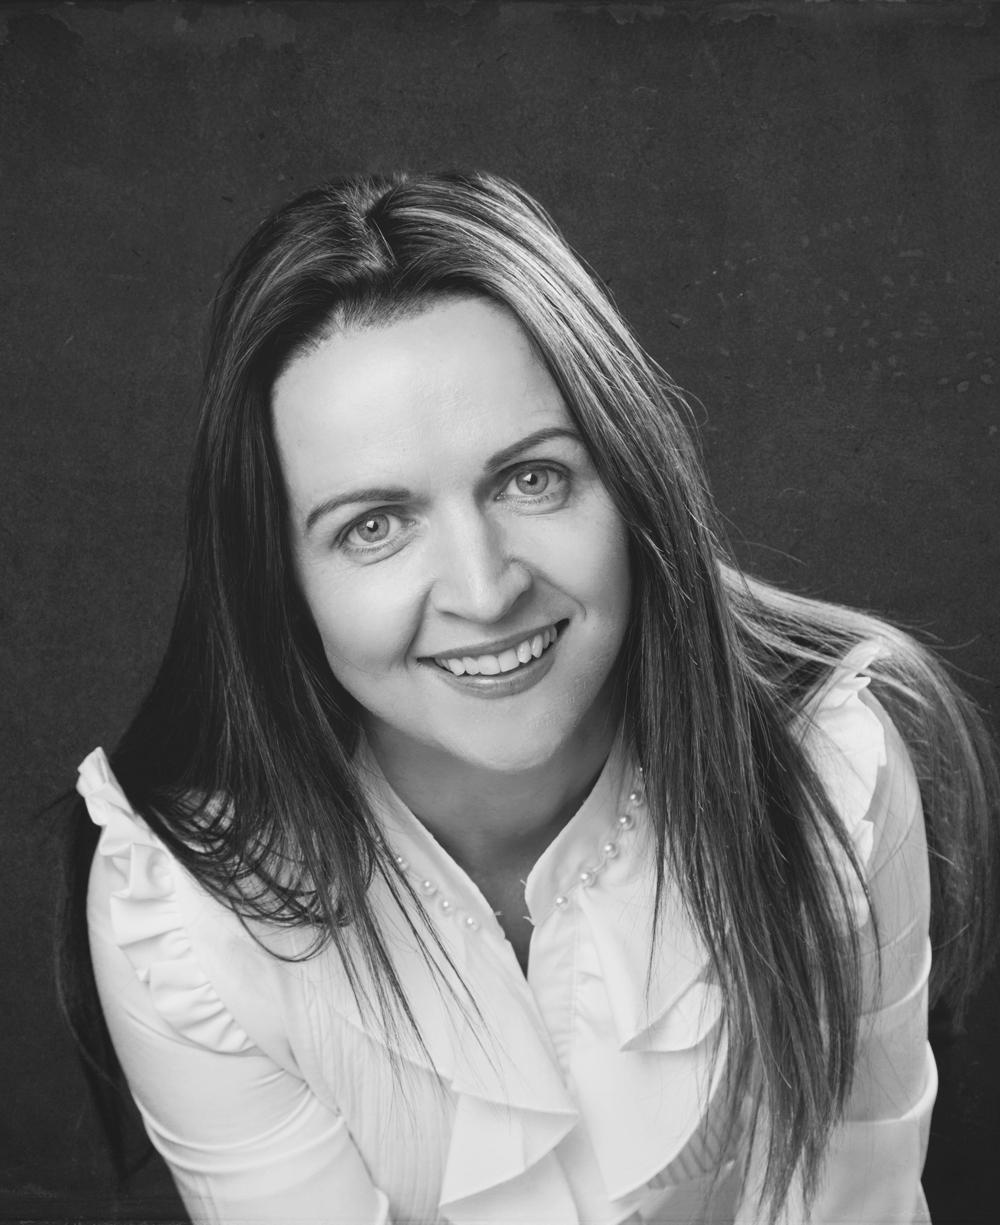 Shauna gibson profile